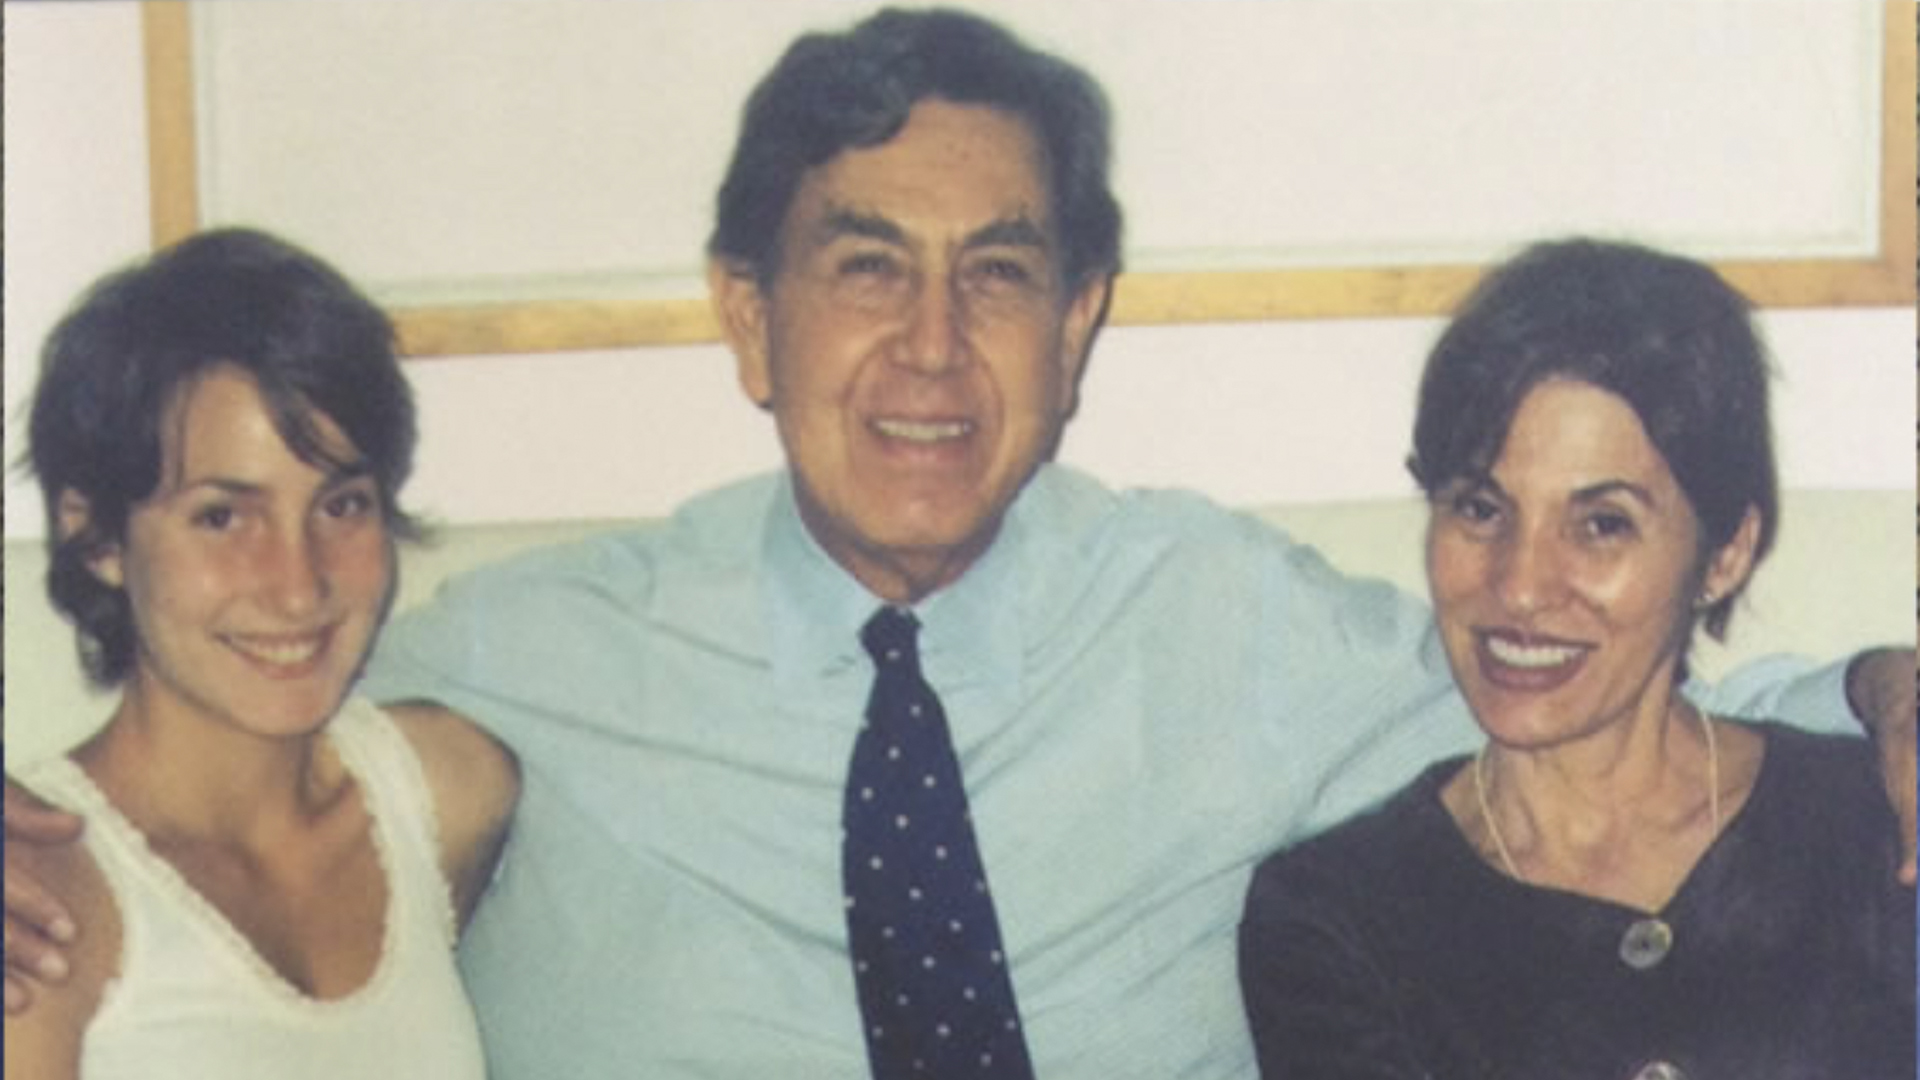 ¿Quién fue Celeste Batel, esposa de Cuauhtémoc Cárdenas?